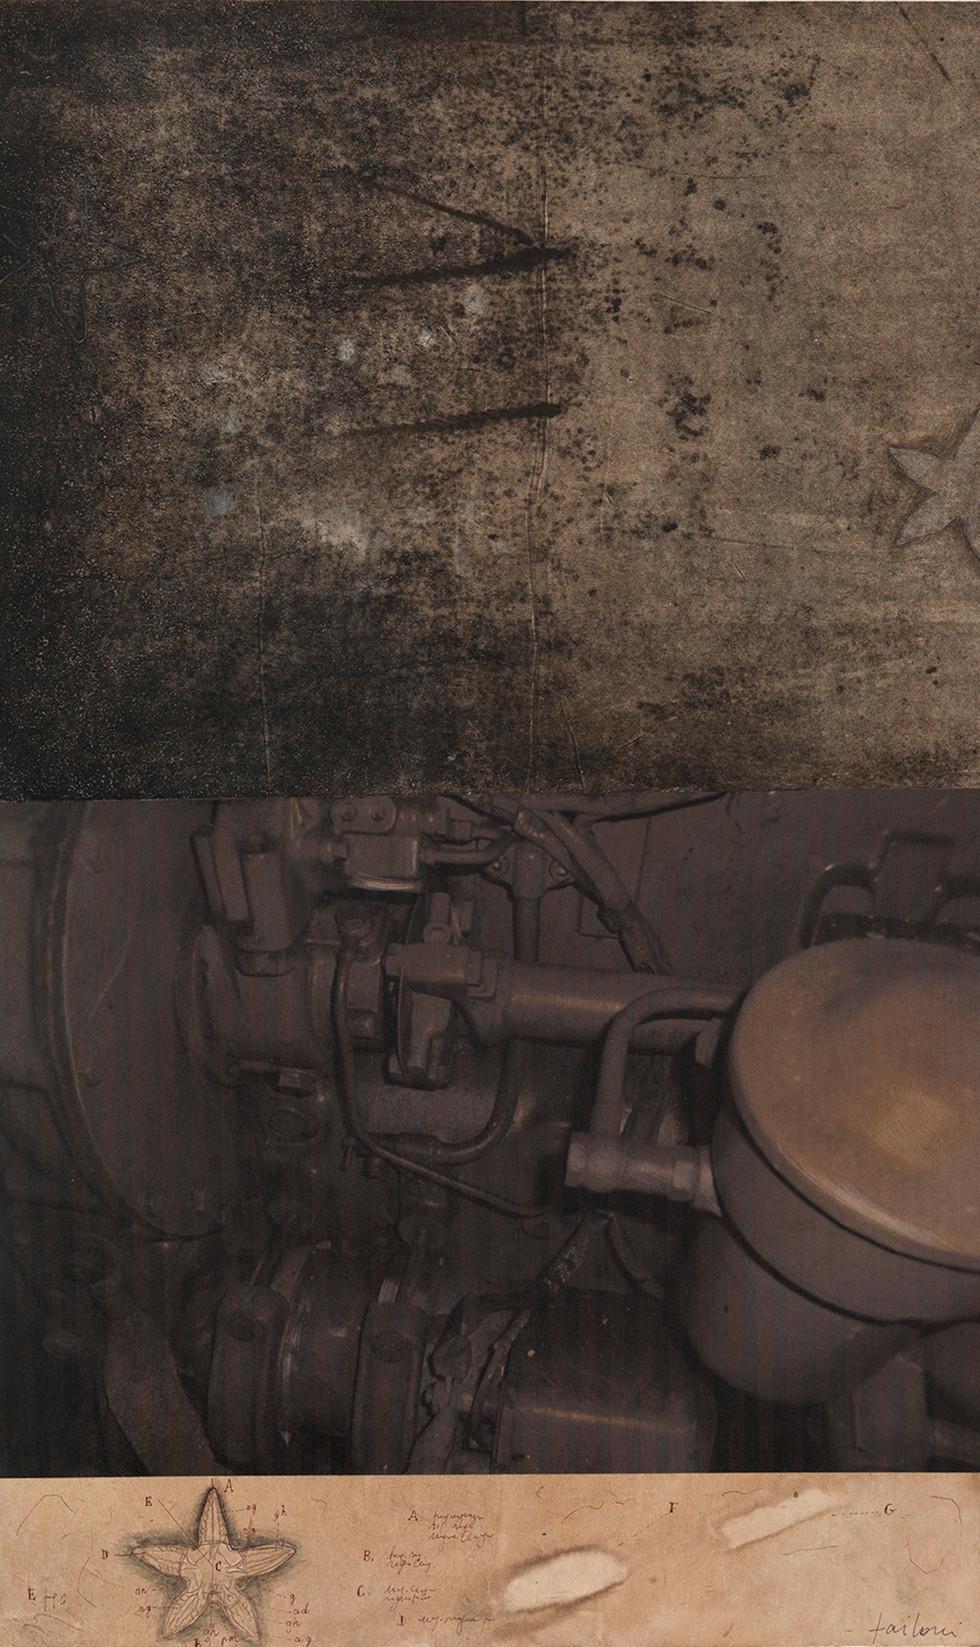 Ursus, 2009, tecnica mista su carta, cm 65 x 38,5